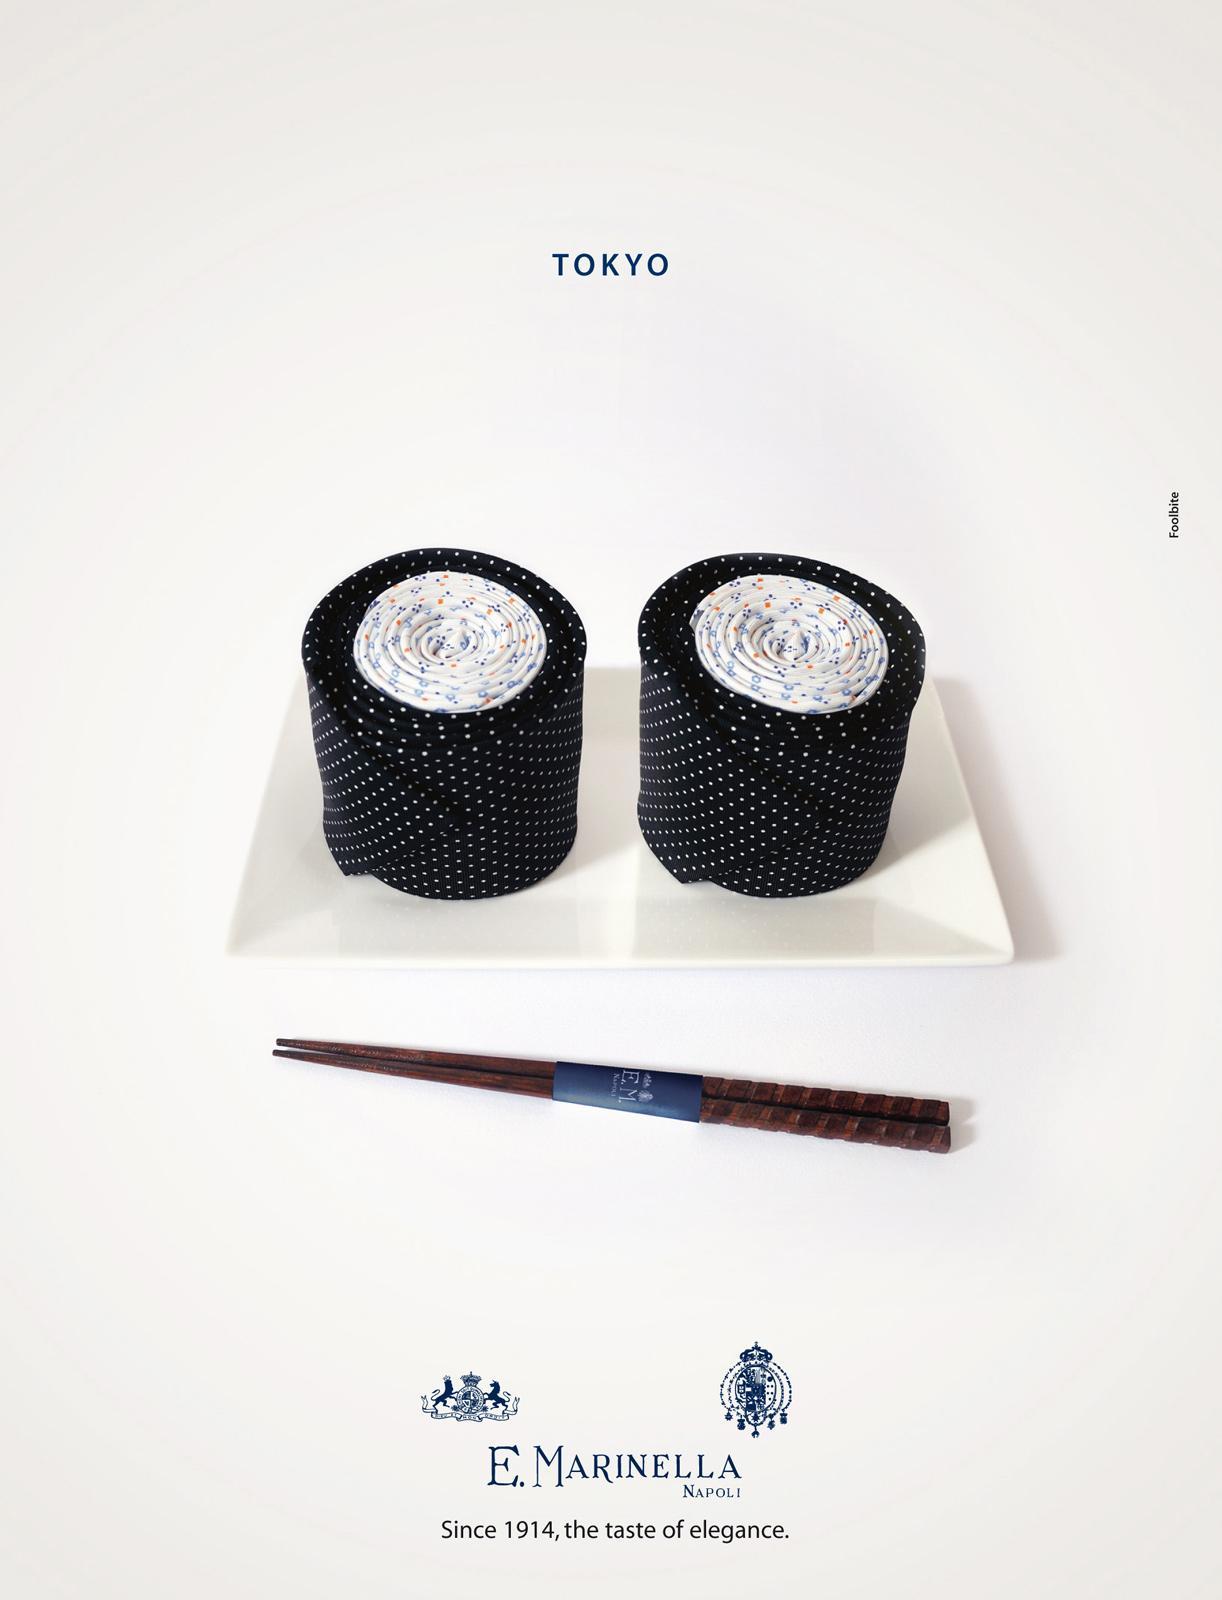 Marinella Print Ad -  Tokyo